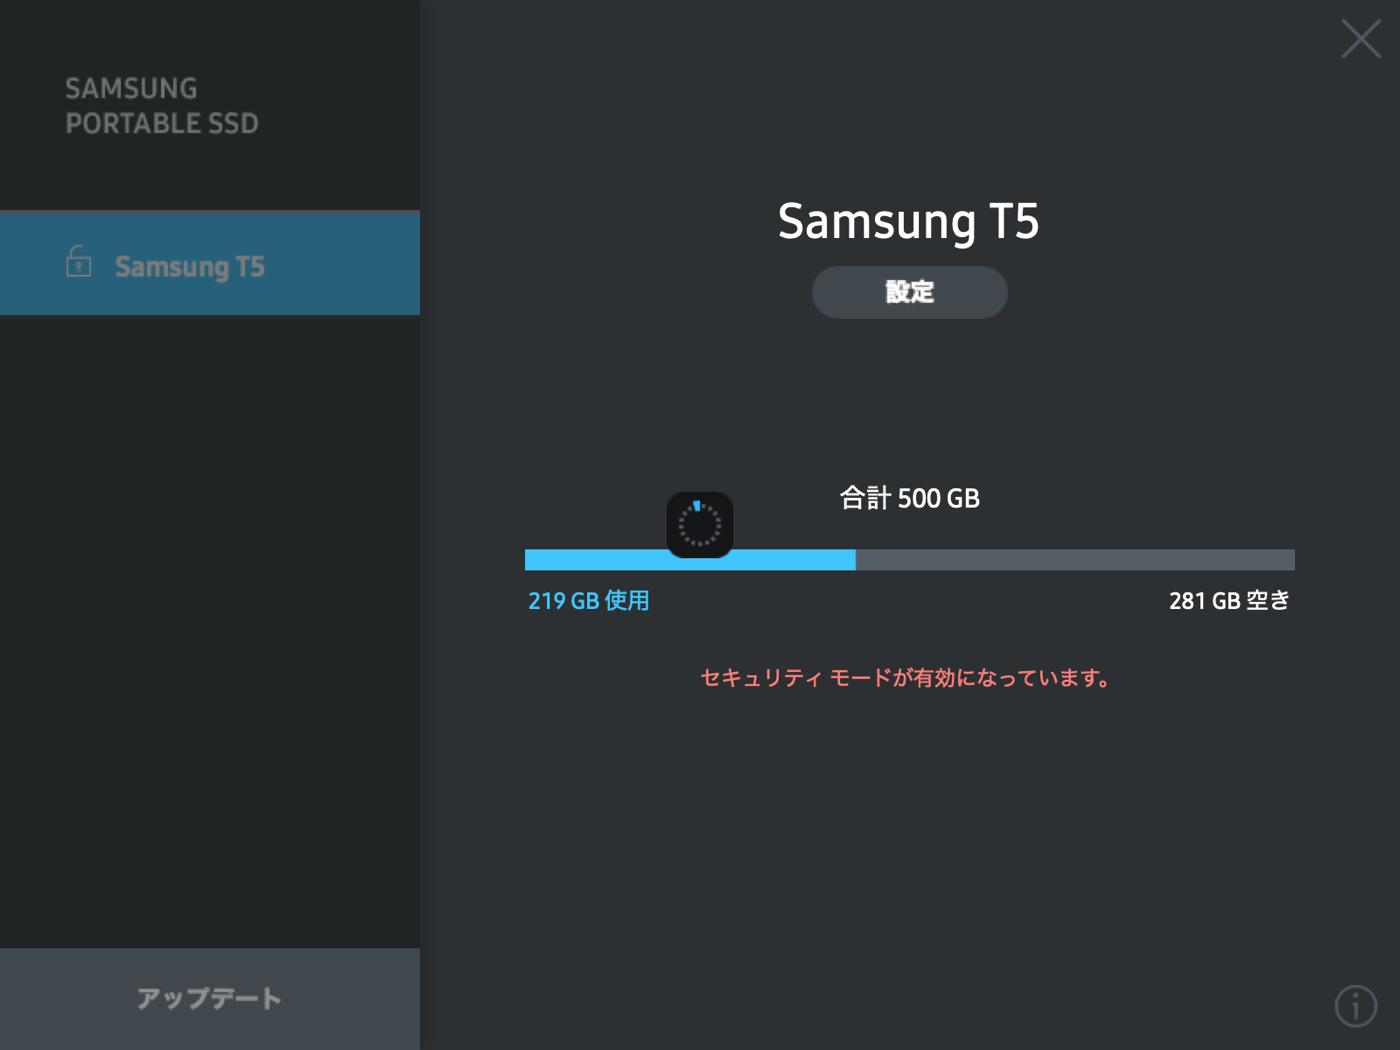 SamsungPortableSSD secutirymodeOFF 01